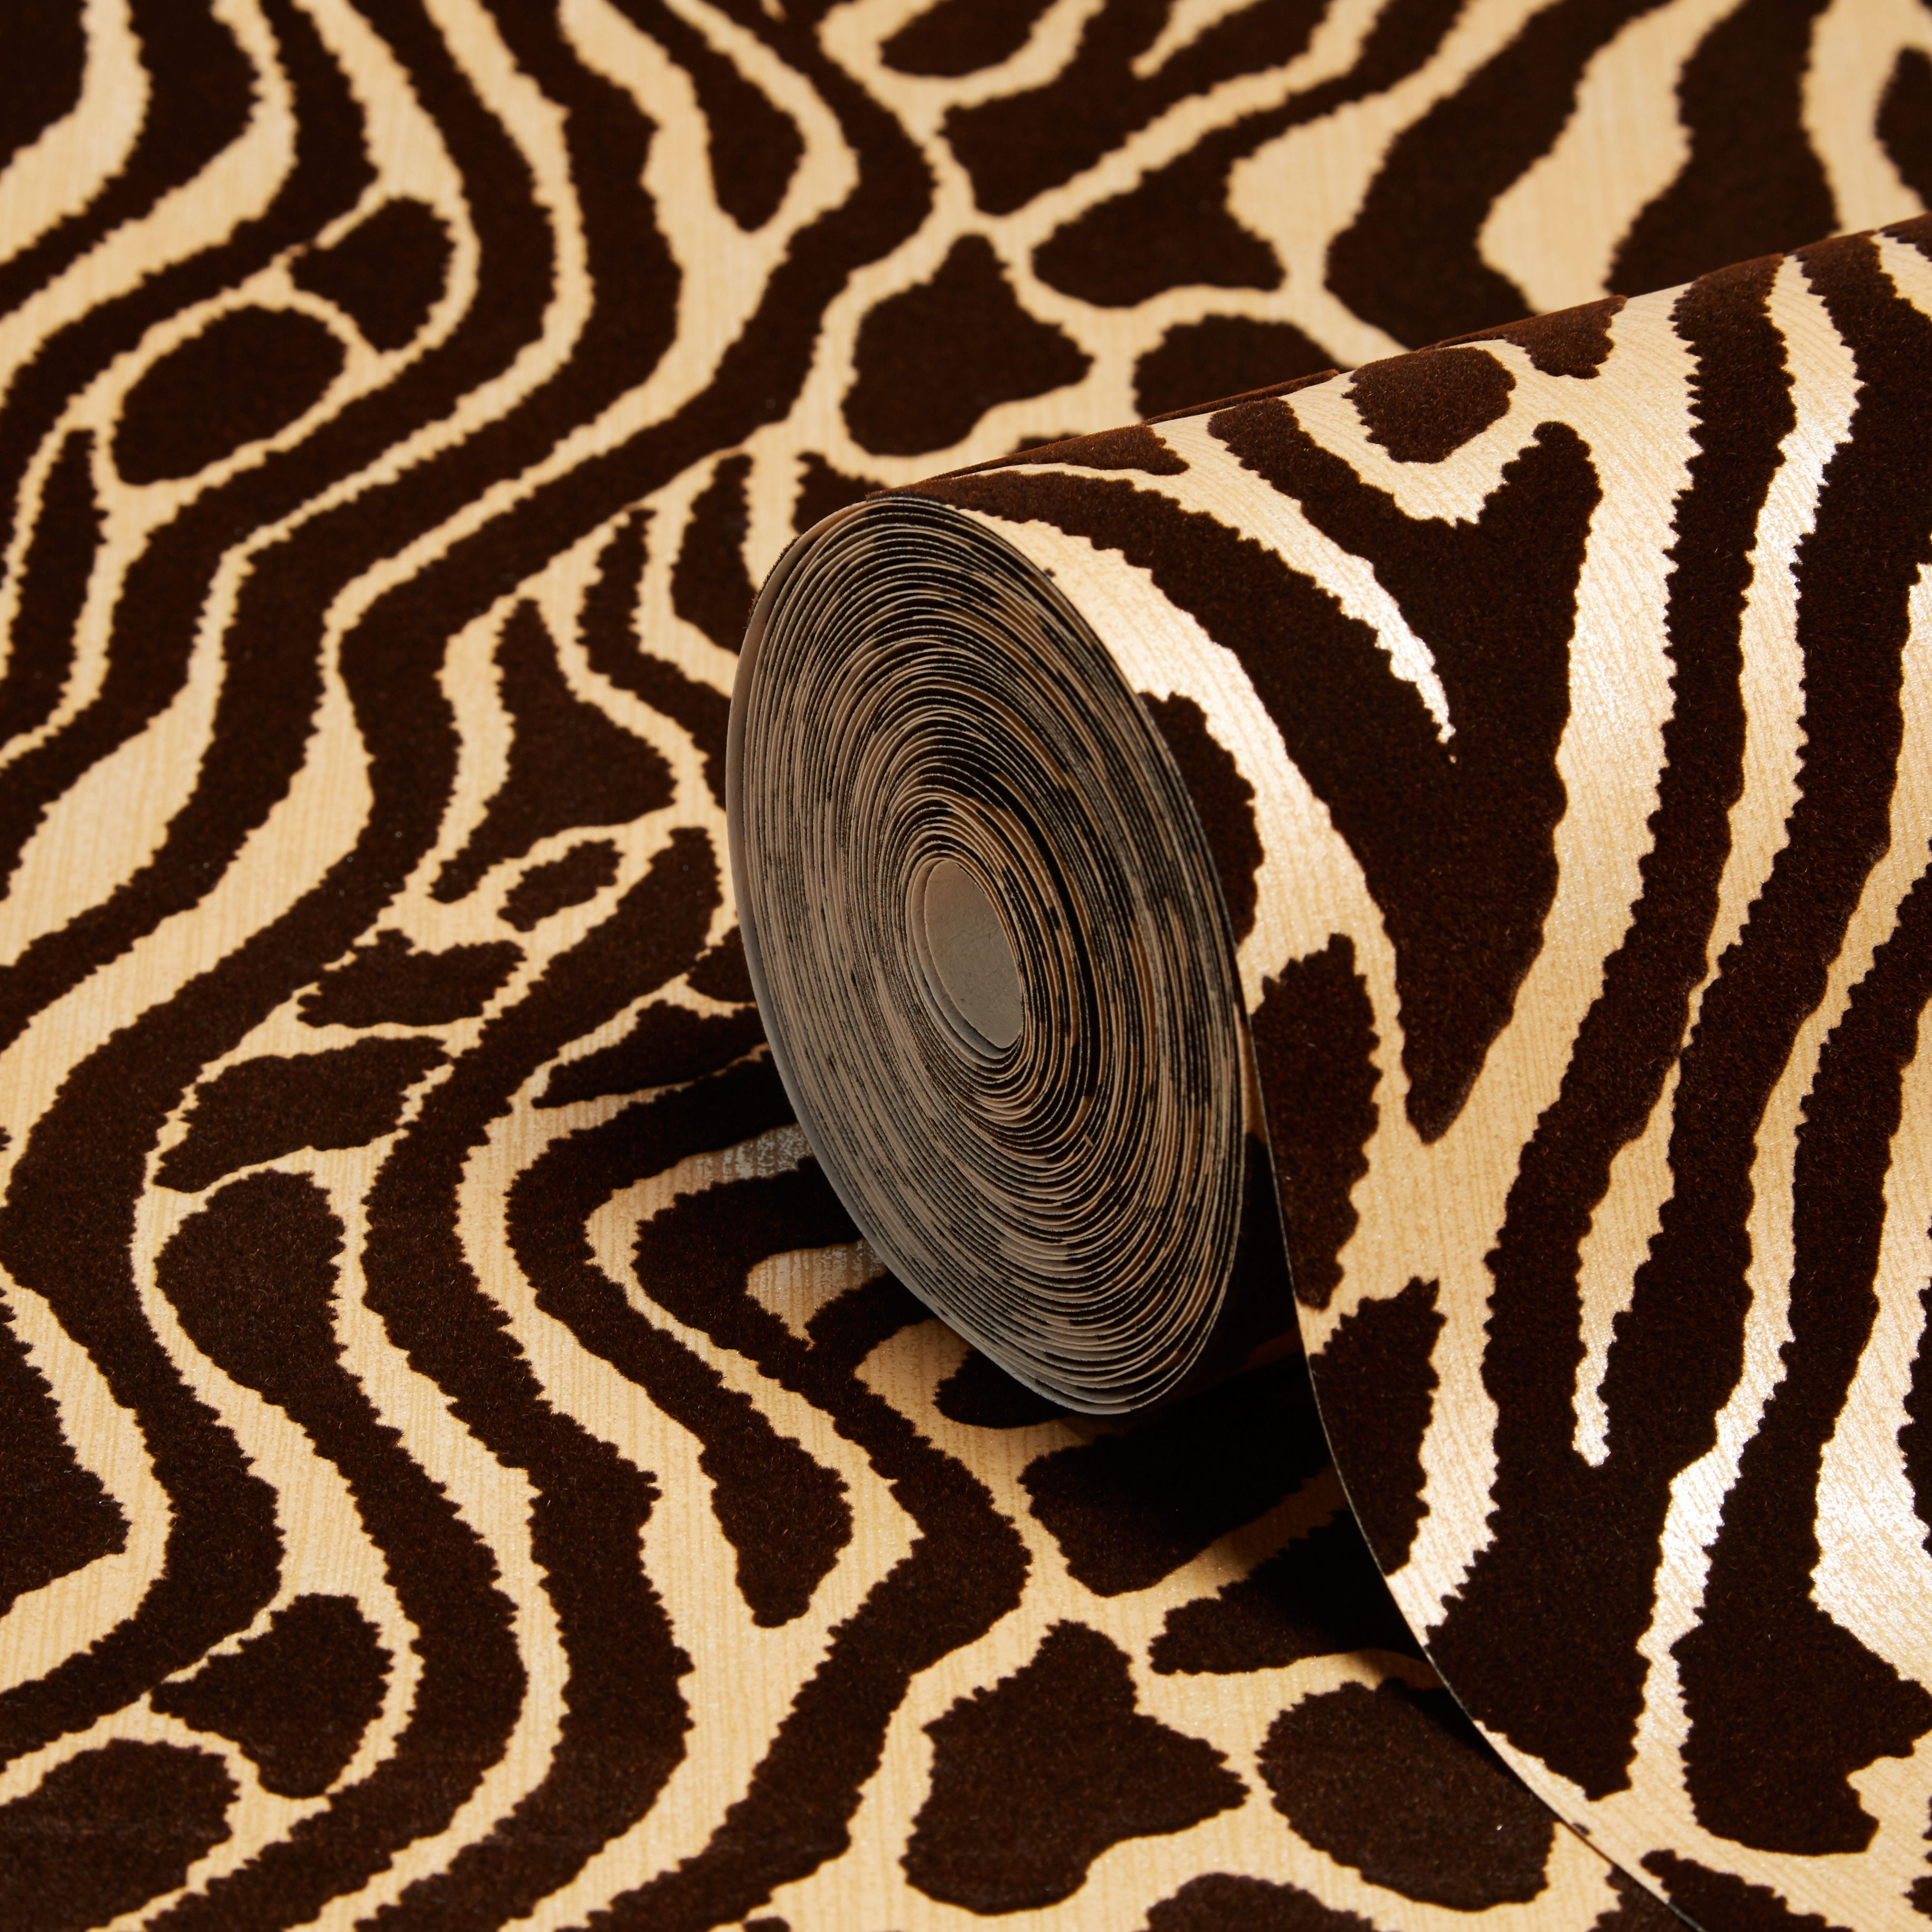 Graham Brown Julien Macdonald Caffe Gold Animal Print Wallpaper Departments Diy At B Q